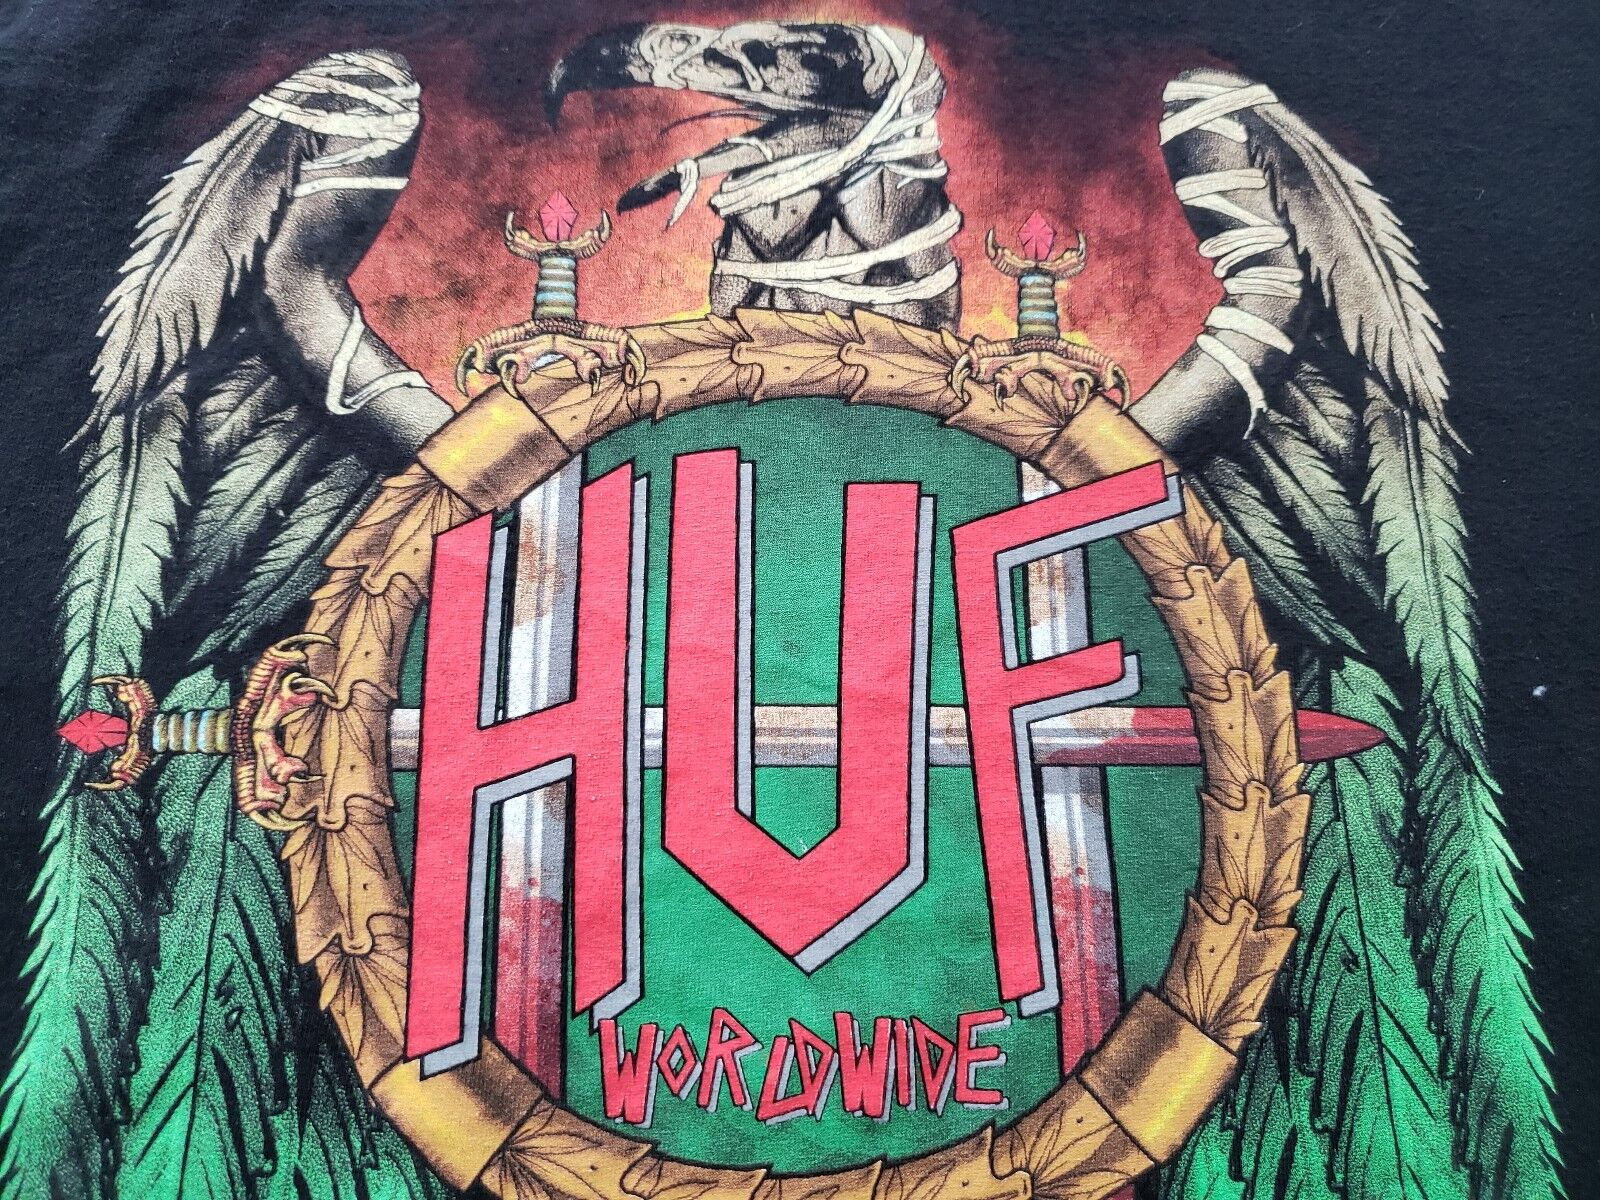 ORIGINAL HUF WORLDWIDE LEGALIZATION TOUR SOME CANCELED DATES 2016 MENS t-shirt L